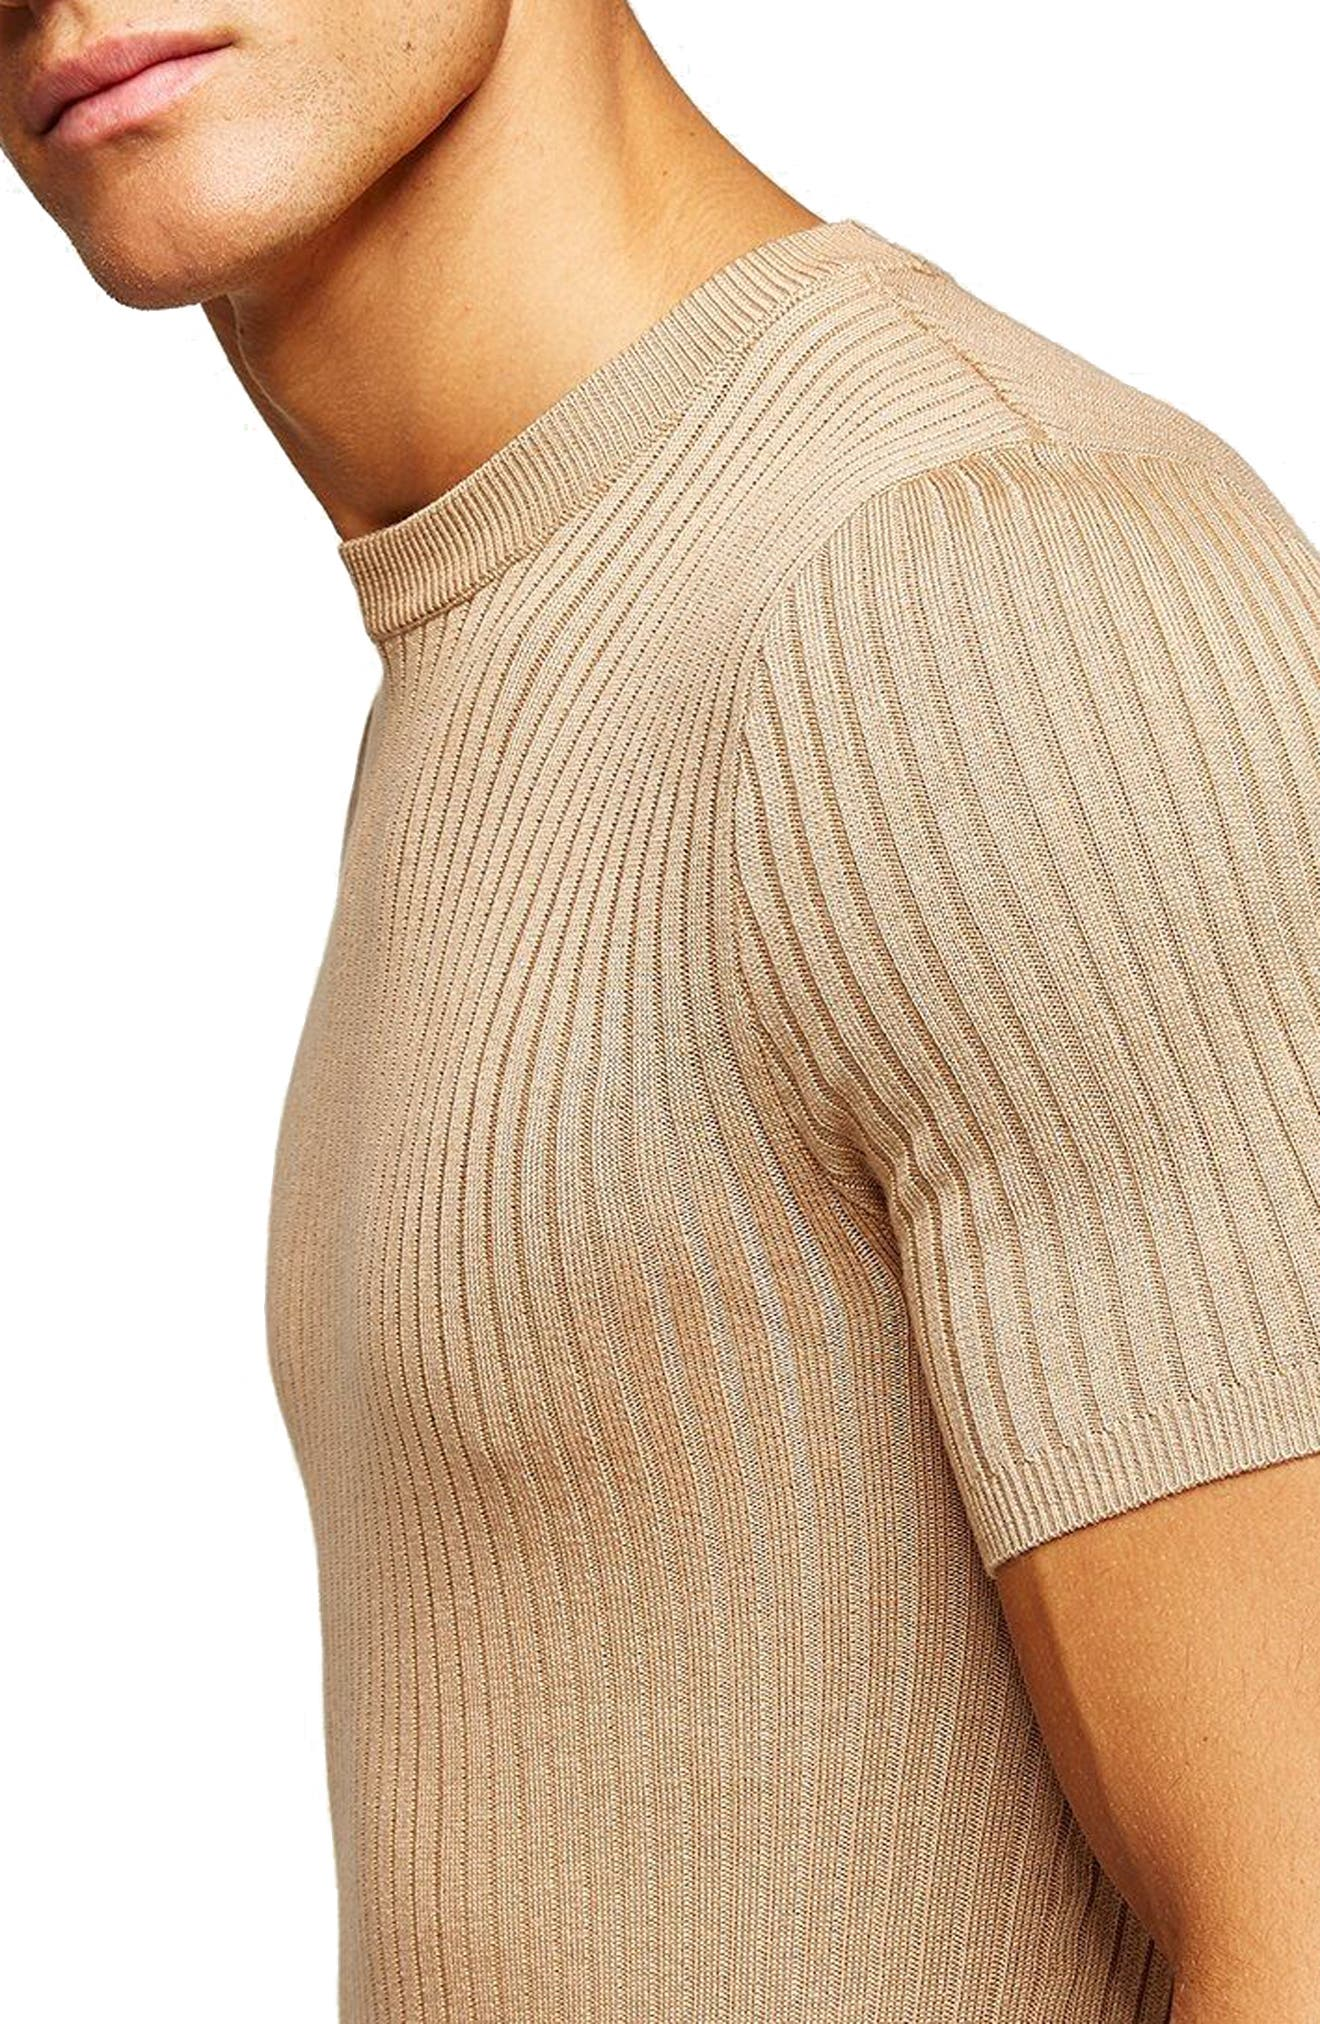 TOPMAN,                             Short Sleeve Muscle Fit Shirt,                             Alternate thumbnail 3, color,                             250